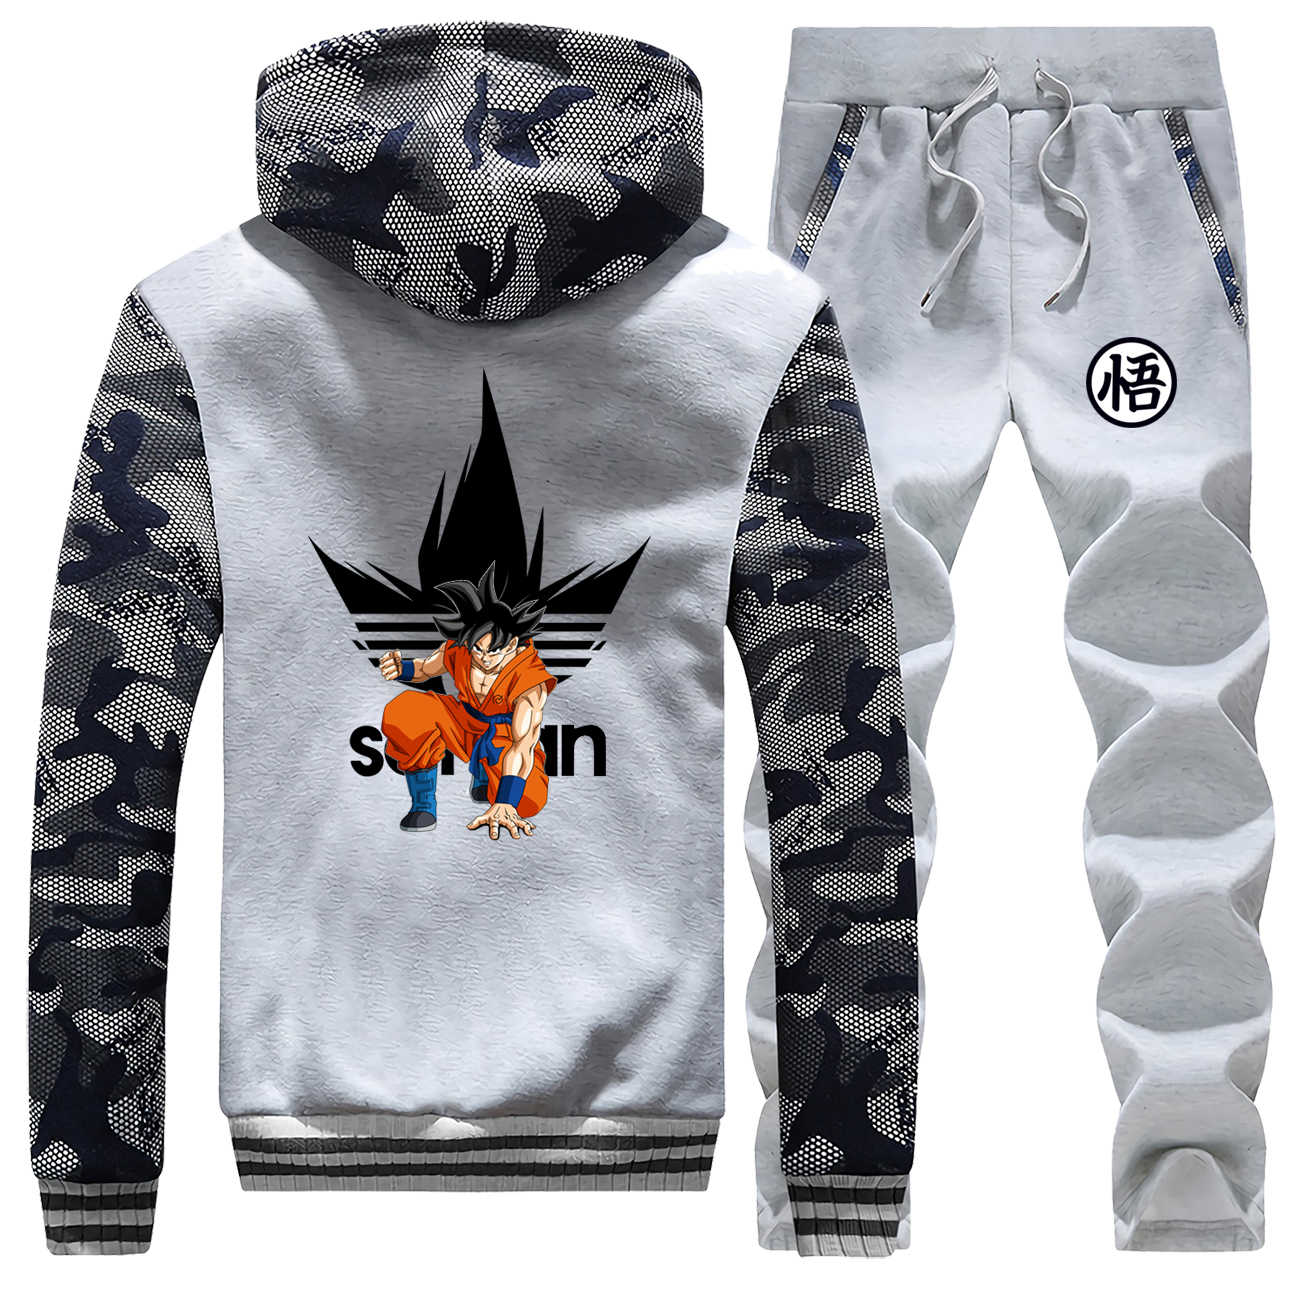 Dragon Ball Z Warm Trainingspak Super Saiyan Merk mannen Dikke Sets Japanse Anime 2019 Winter Harajuku Hip Hop Broek sweatshirts